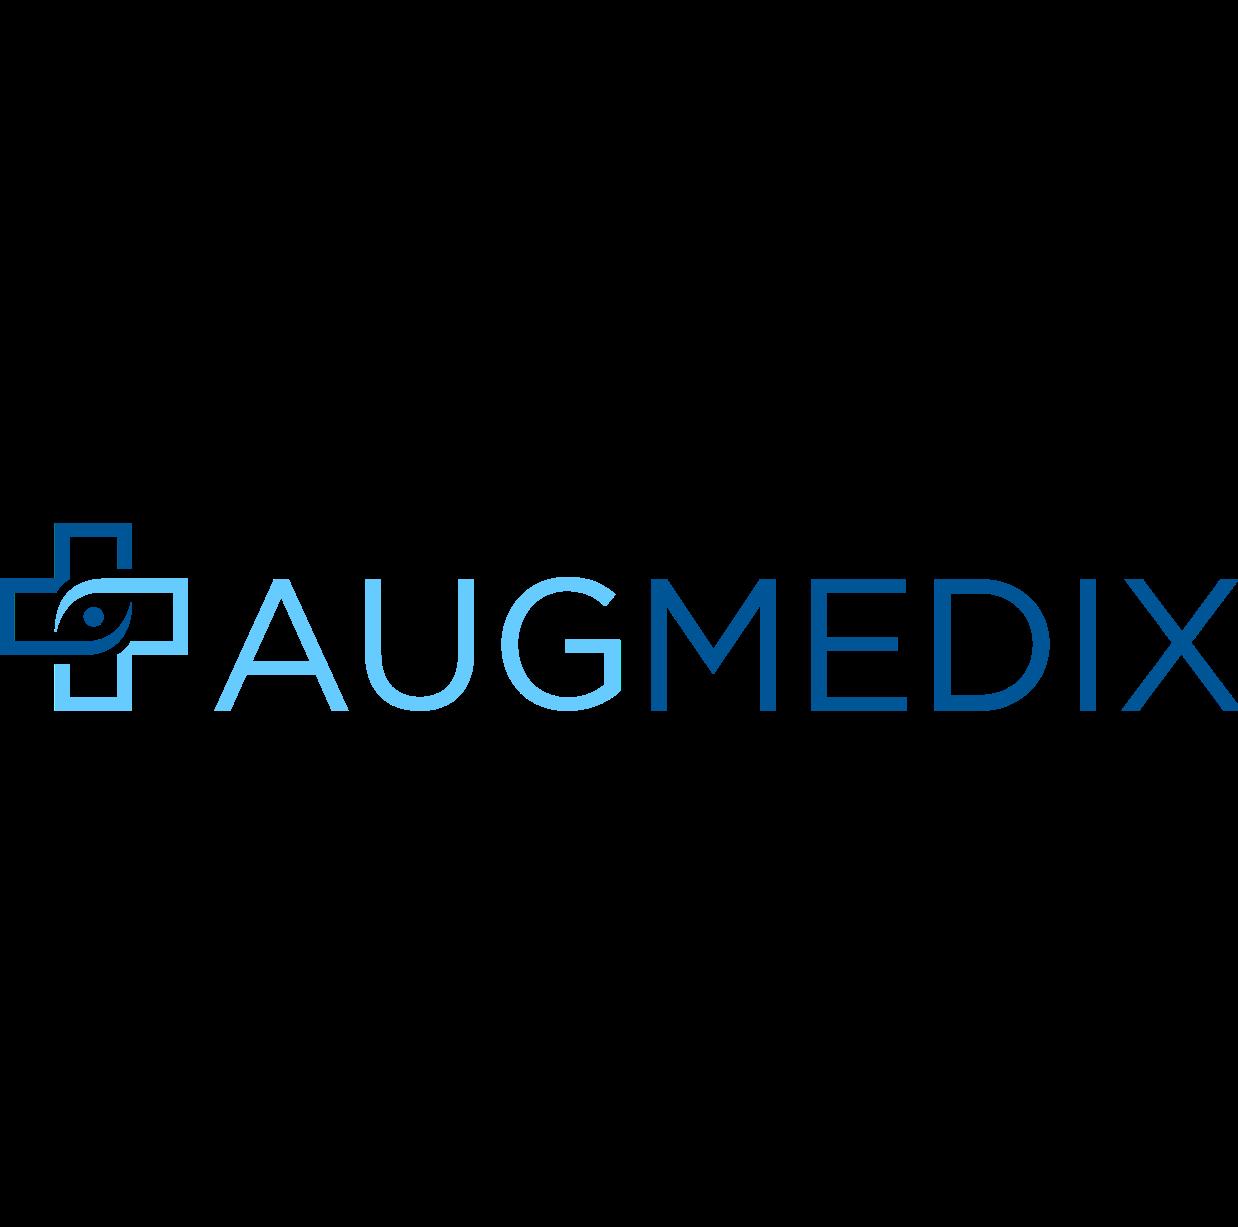 https://assets.roar.media/assets/VgCimwmLUUGHQvbK_Augmedix-logo.png